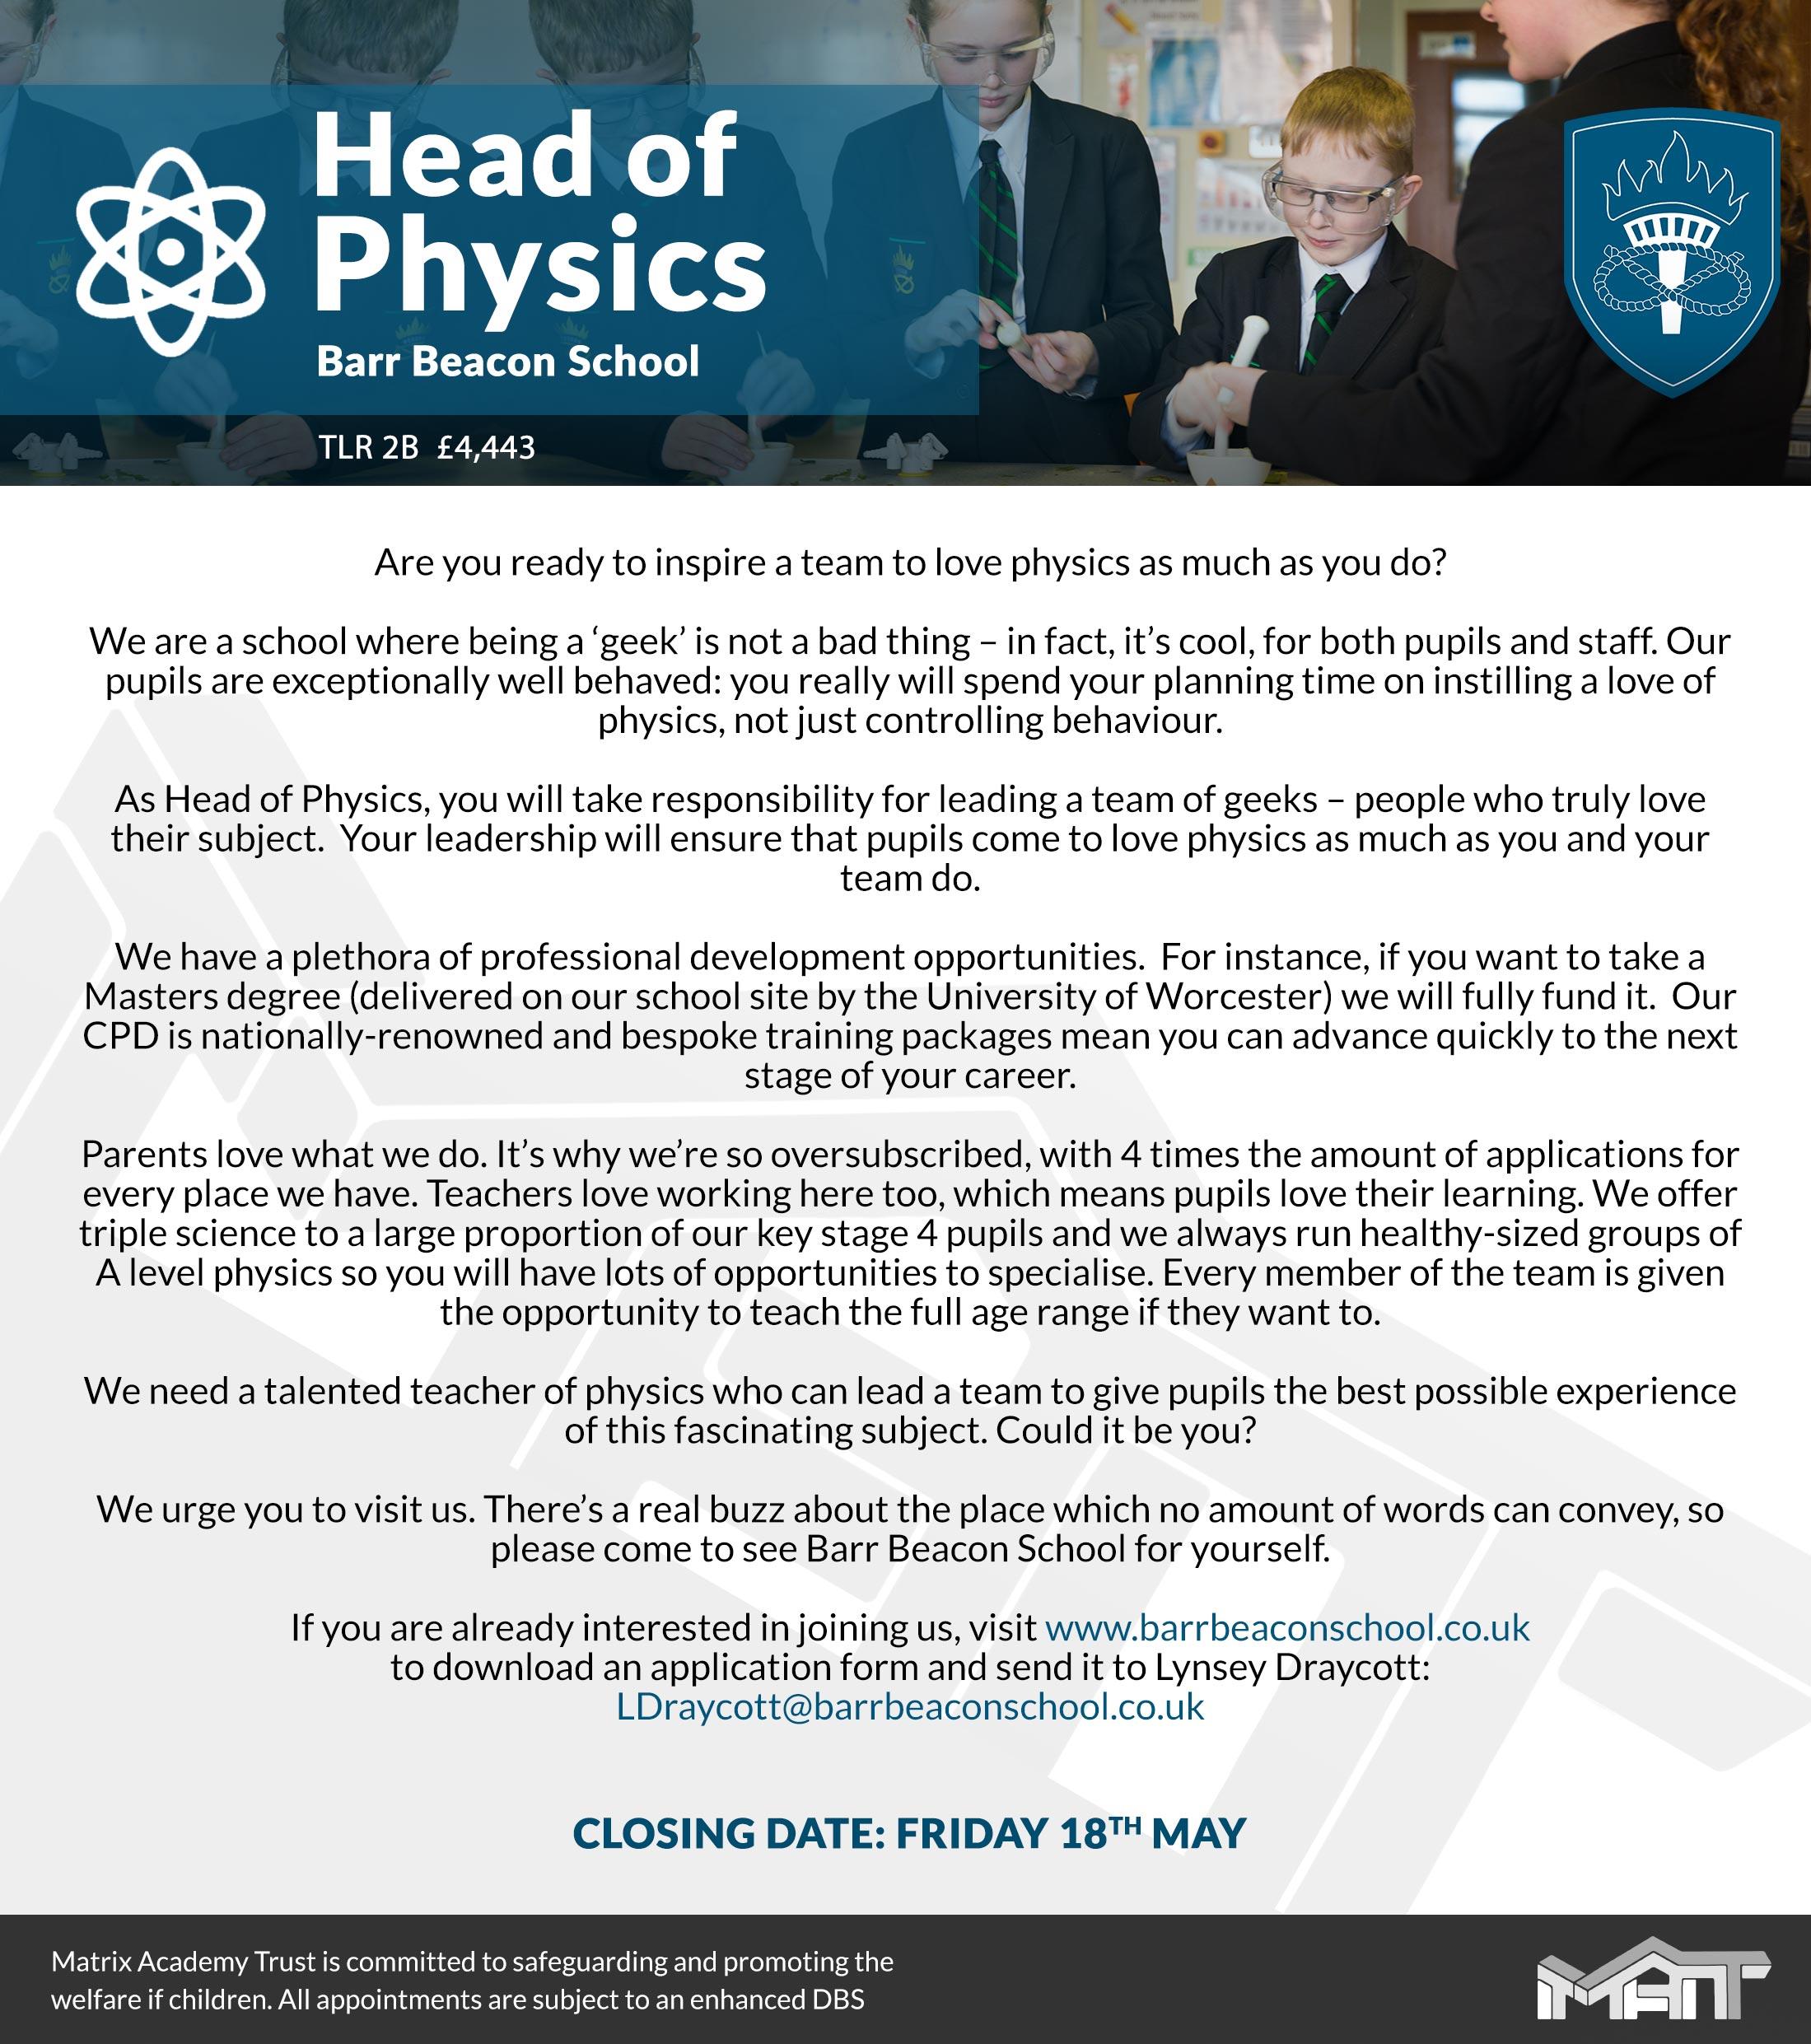 HeadofPhysics Job Application Form Ks on blank generic, free generic, part time,